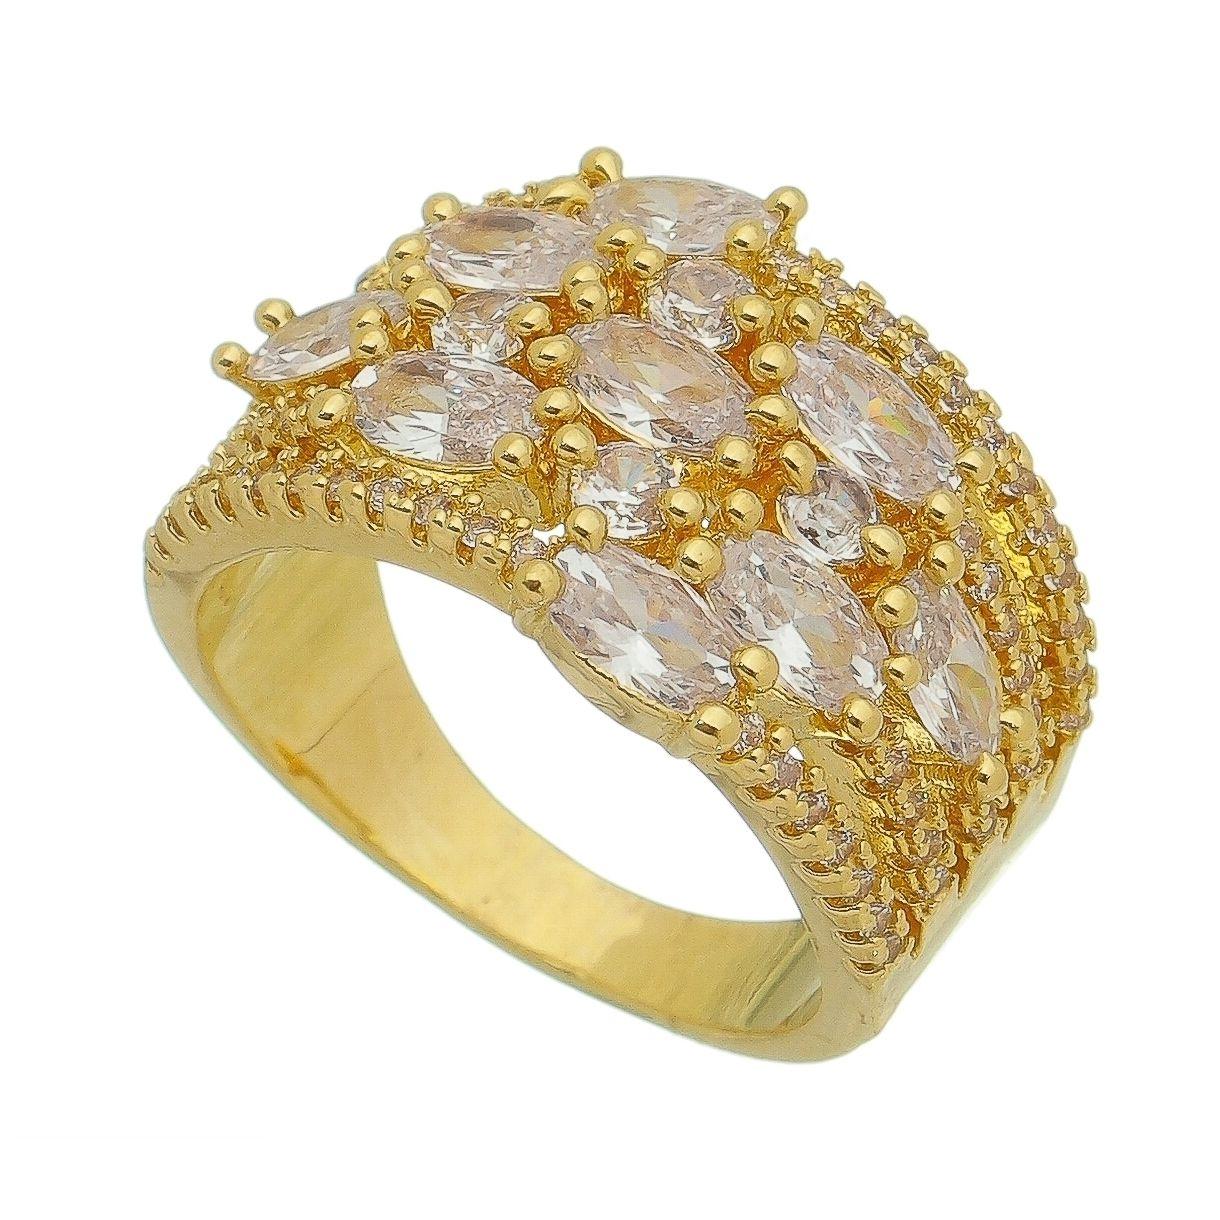 Anel com Navete Zircônia/Cristal Incolor Banho Ouro 18k - Giro Semijoias